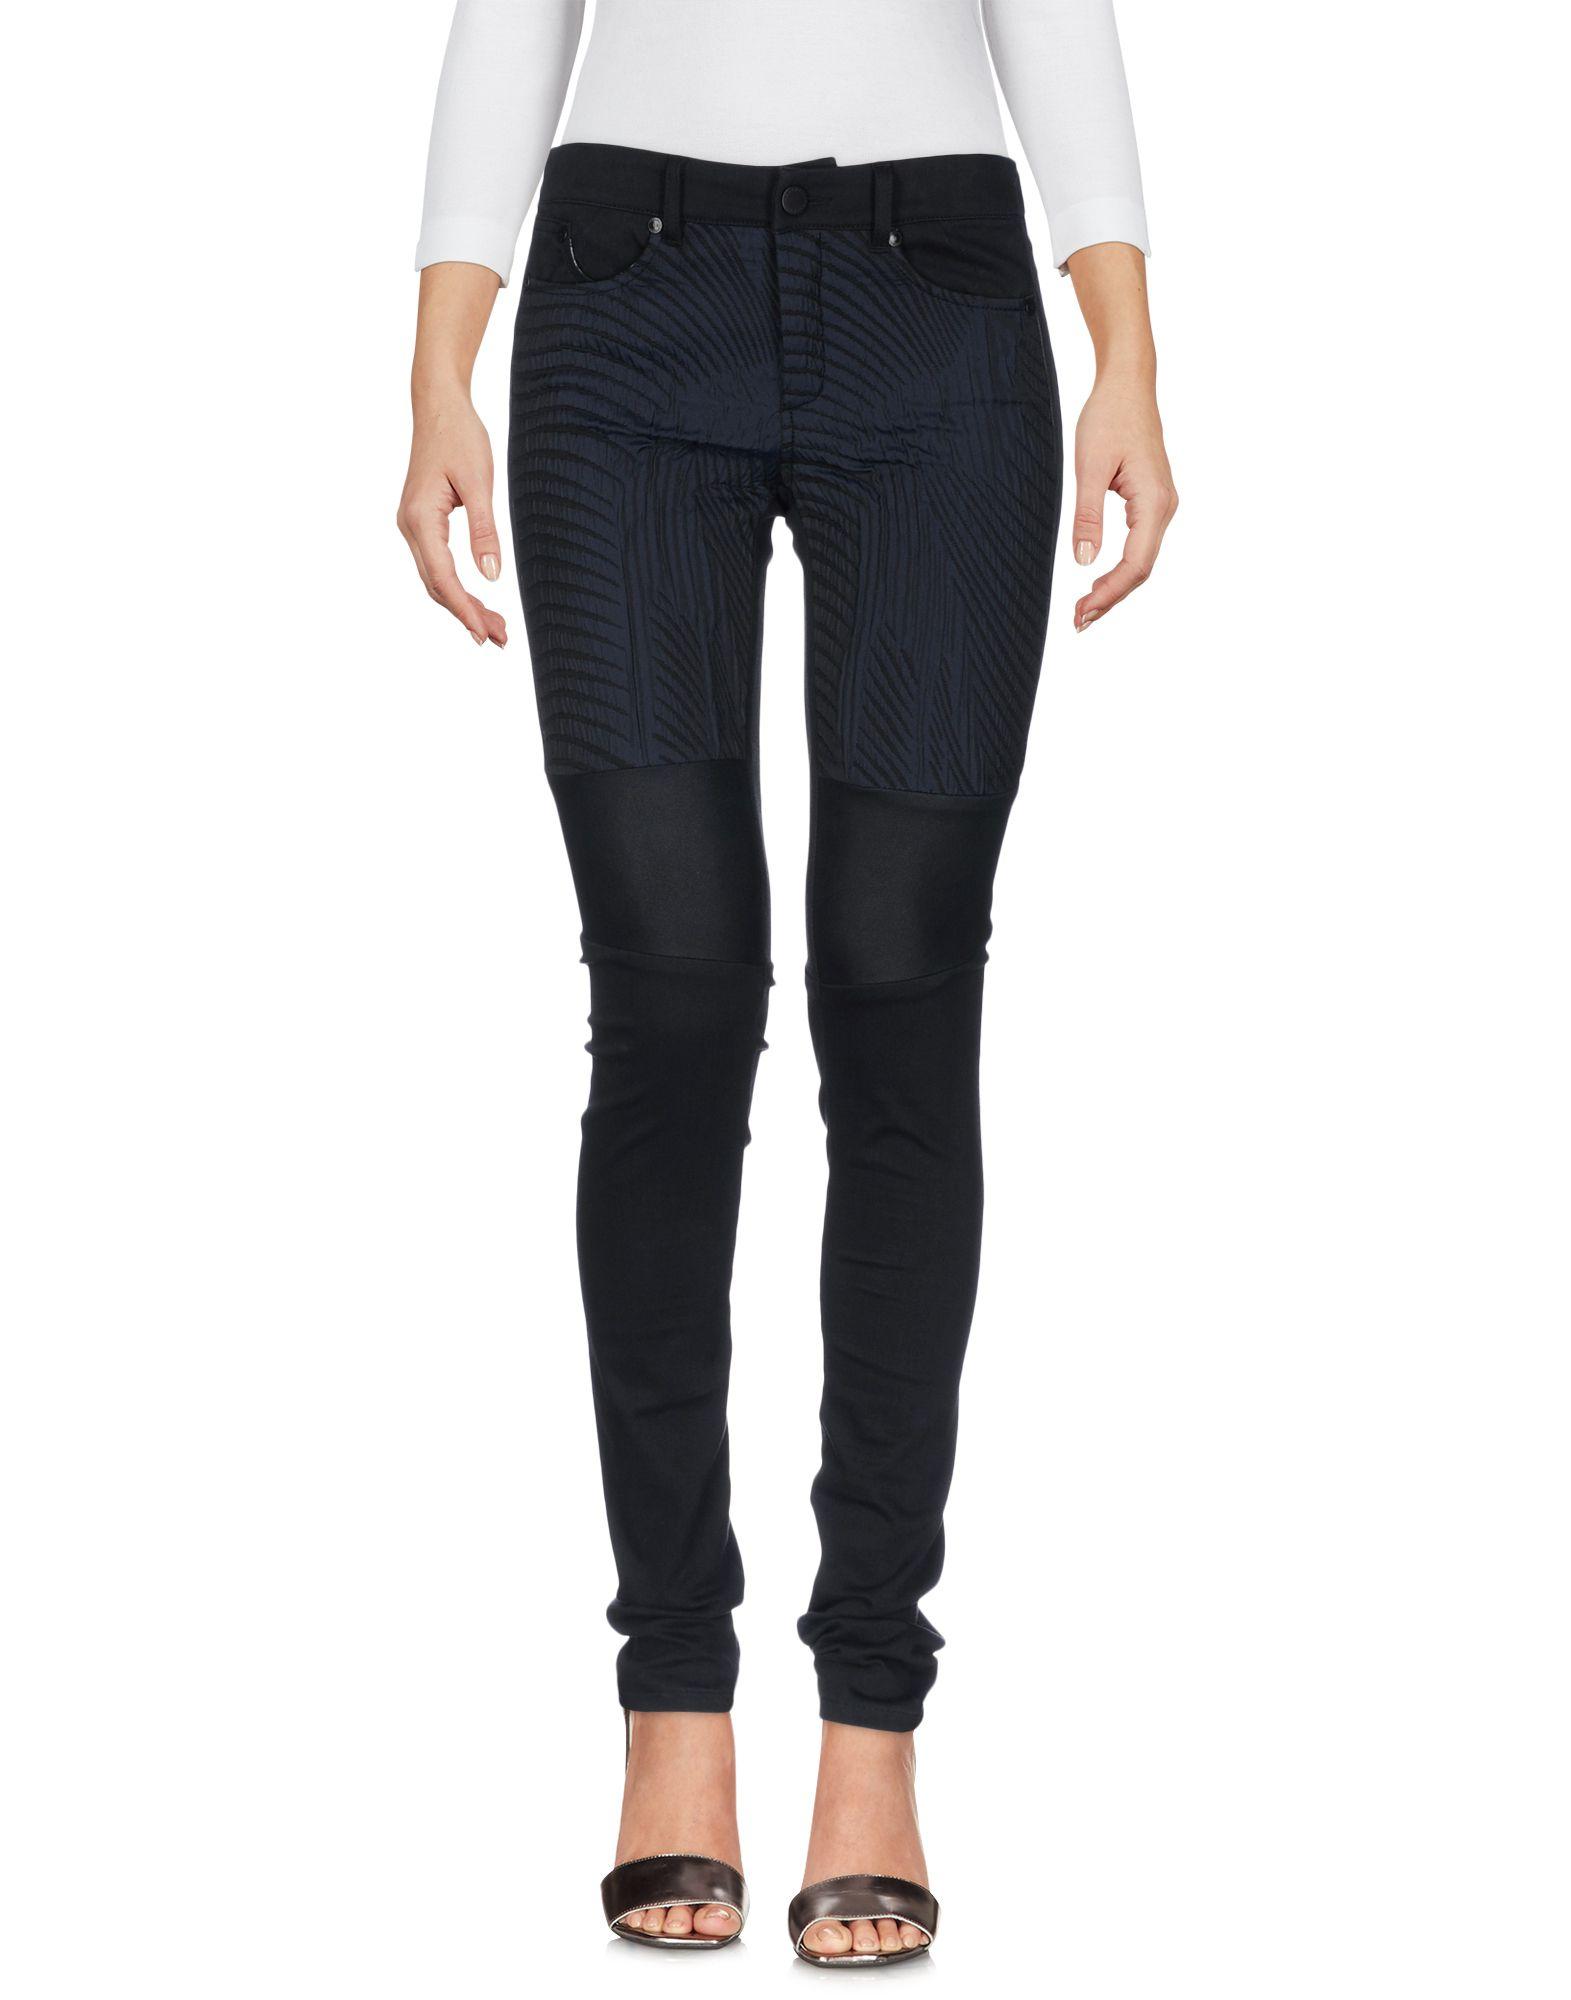 Pantaloni Jeans Superfine Donna - Acquista online su Frgs08m